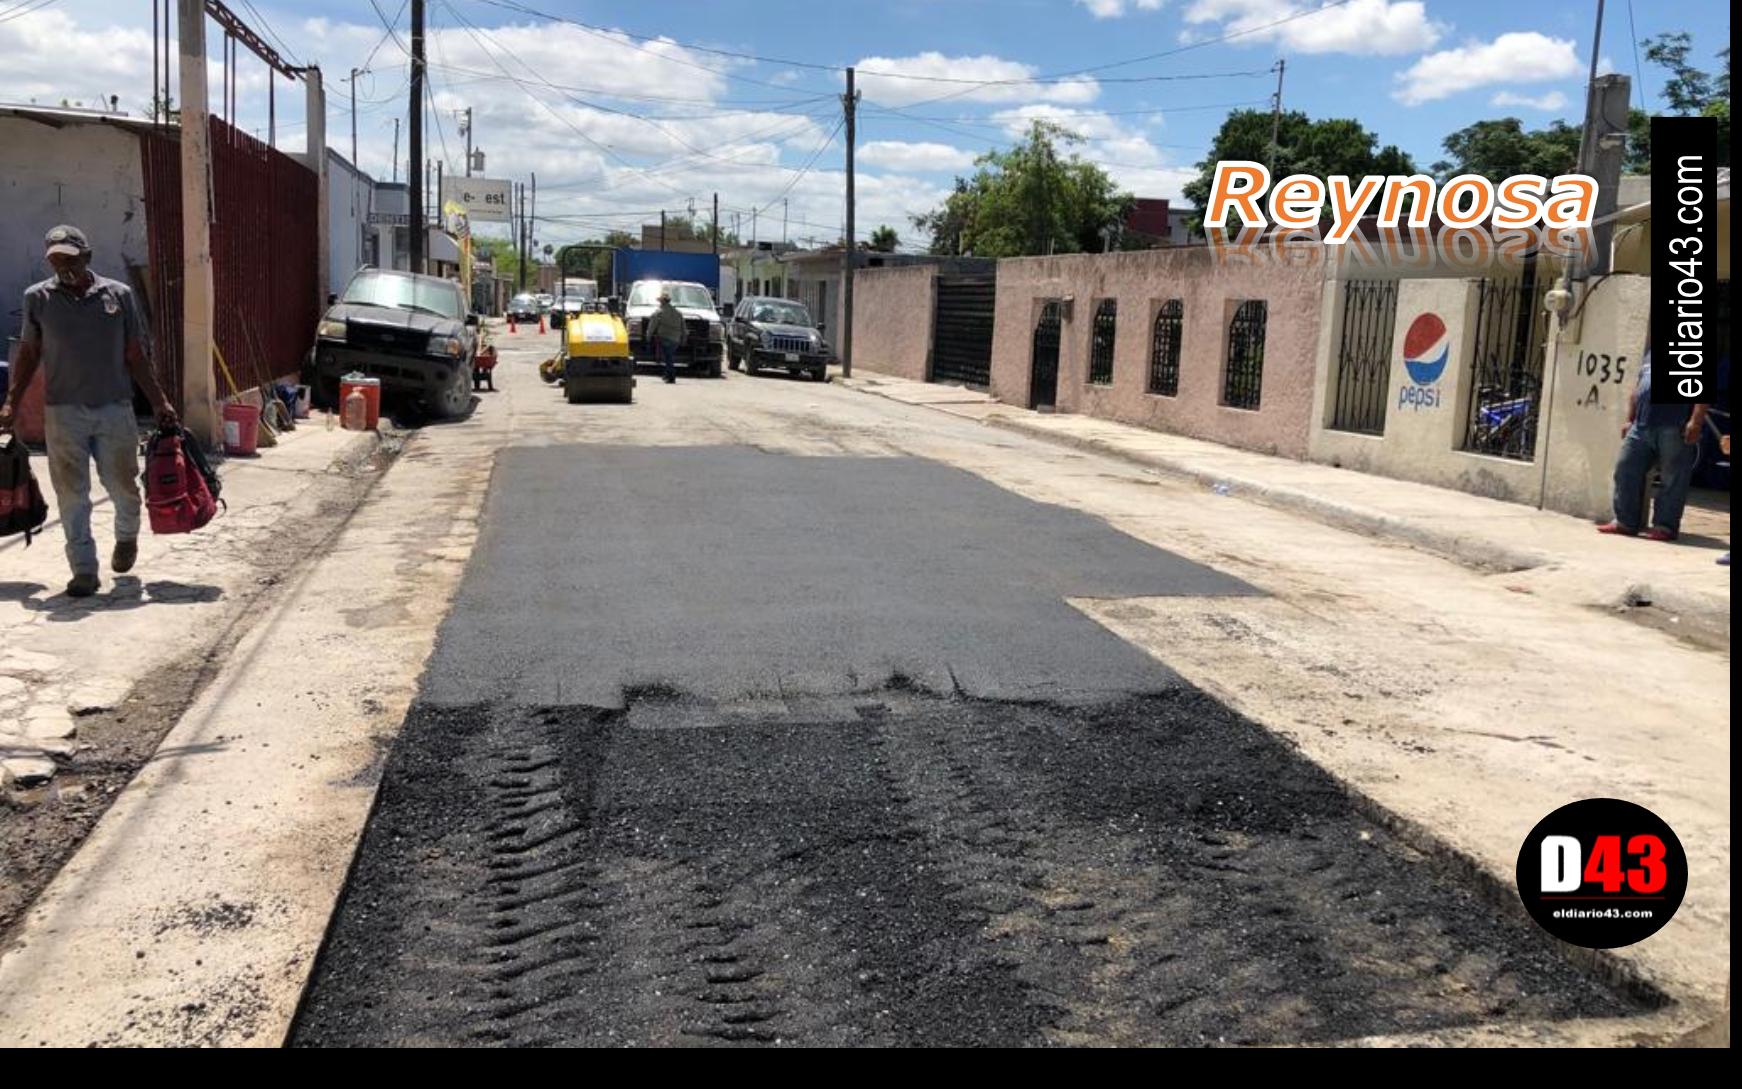 Cuadrillas del Gobierno de Reynosa rehabilitaron 699 baches con más de 950 toneladas de asfalto